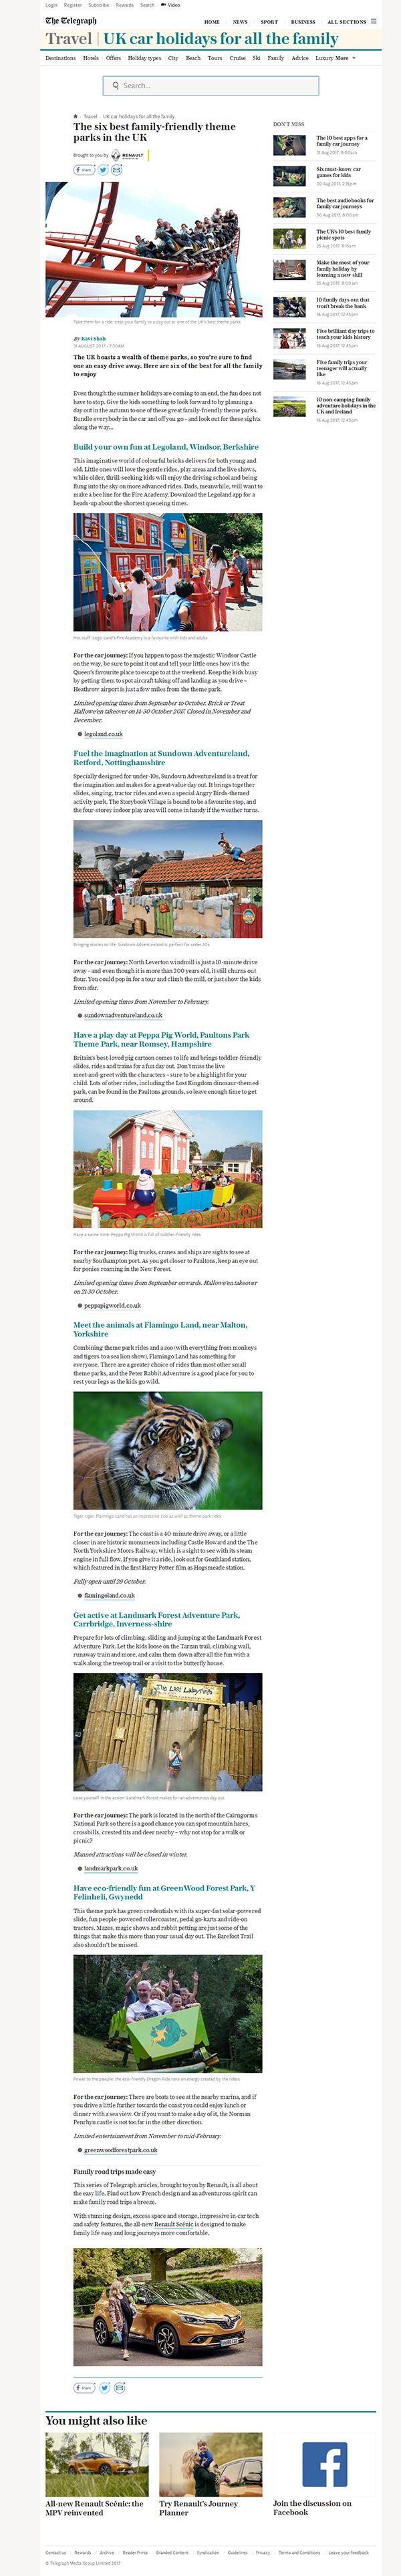 family-friendly-Theme-parks